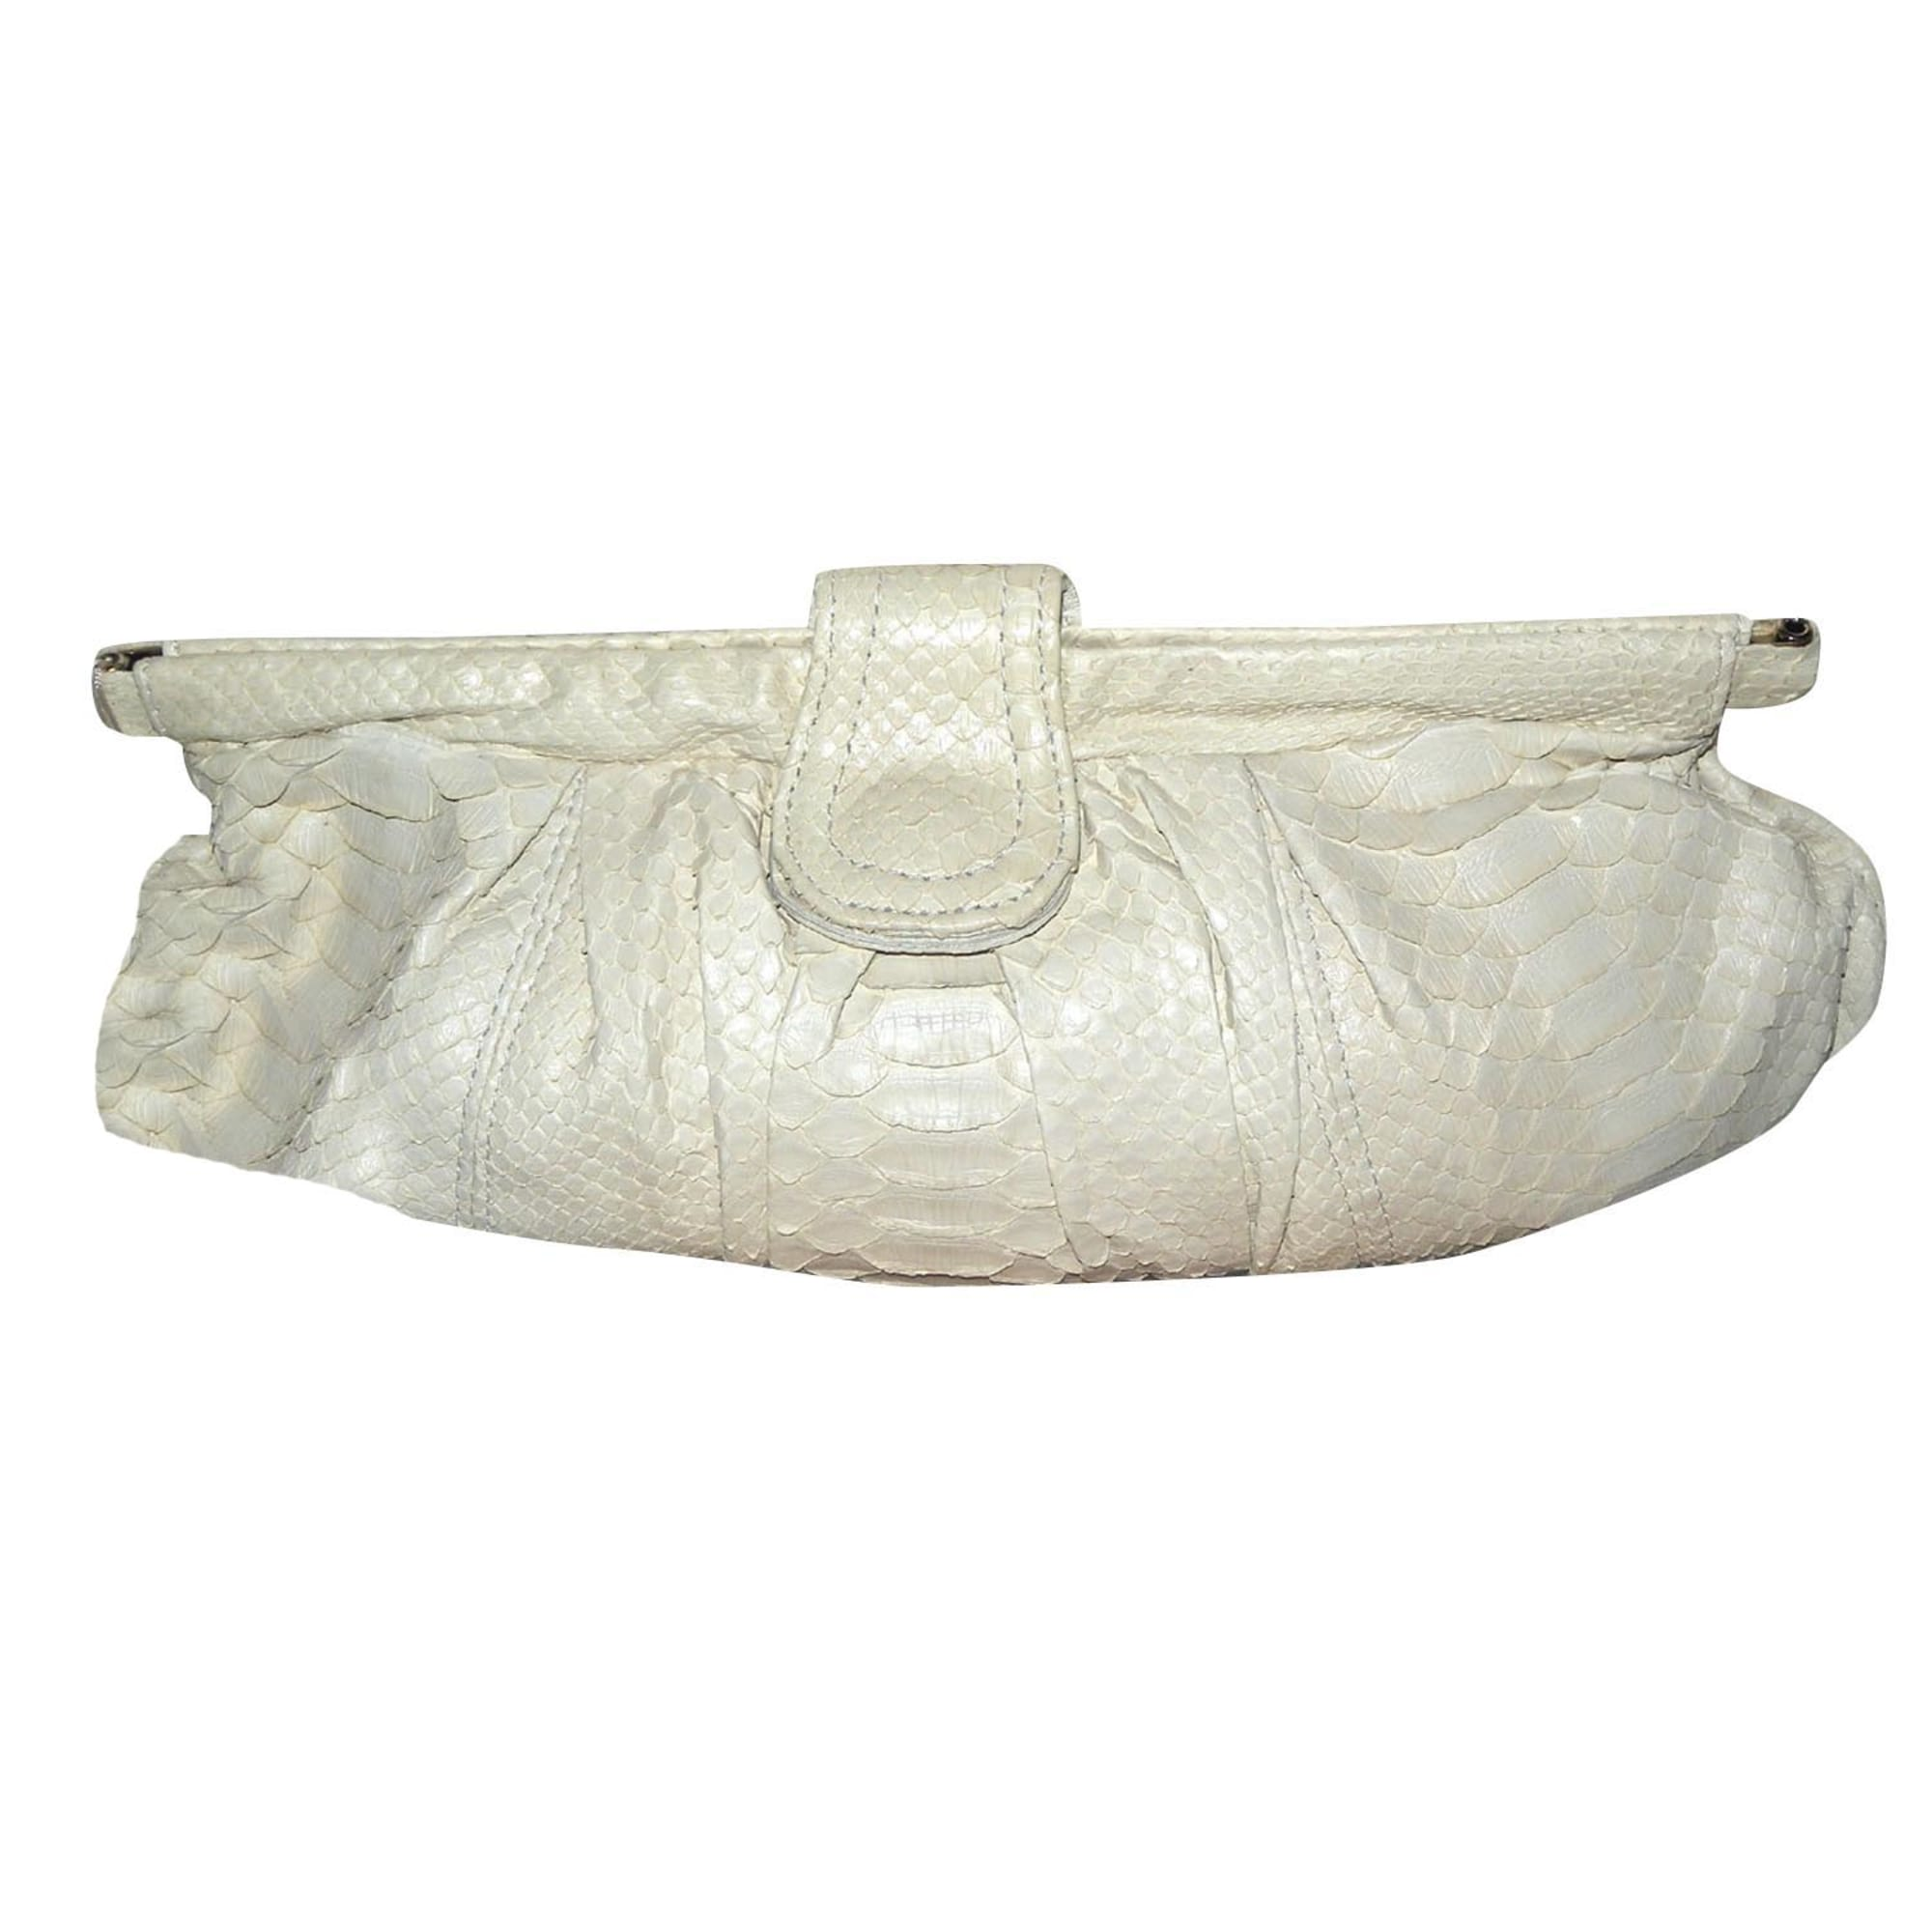 be1ab2e640 Sac pochette en cuir ABACO Blanc, blanc cassé, écru